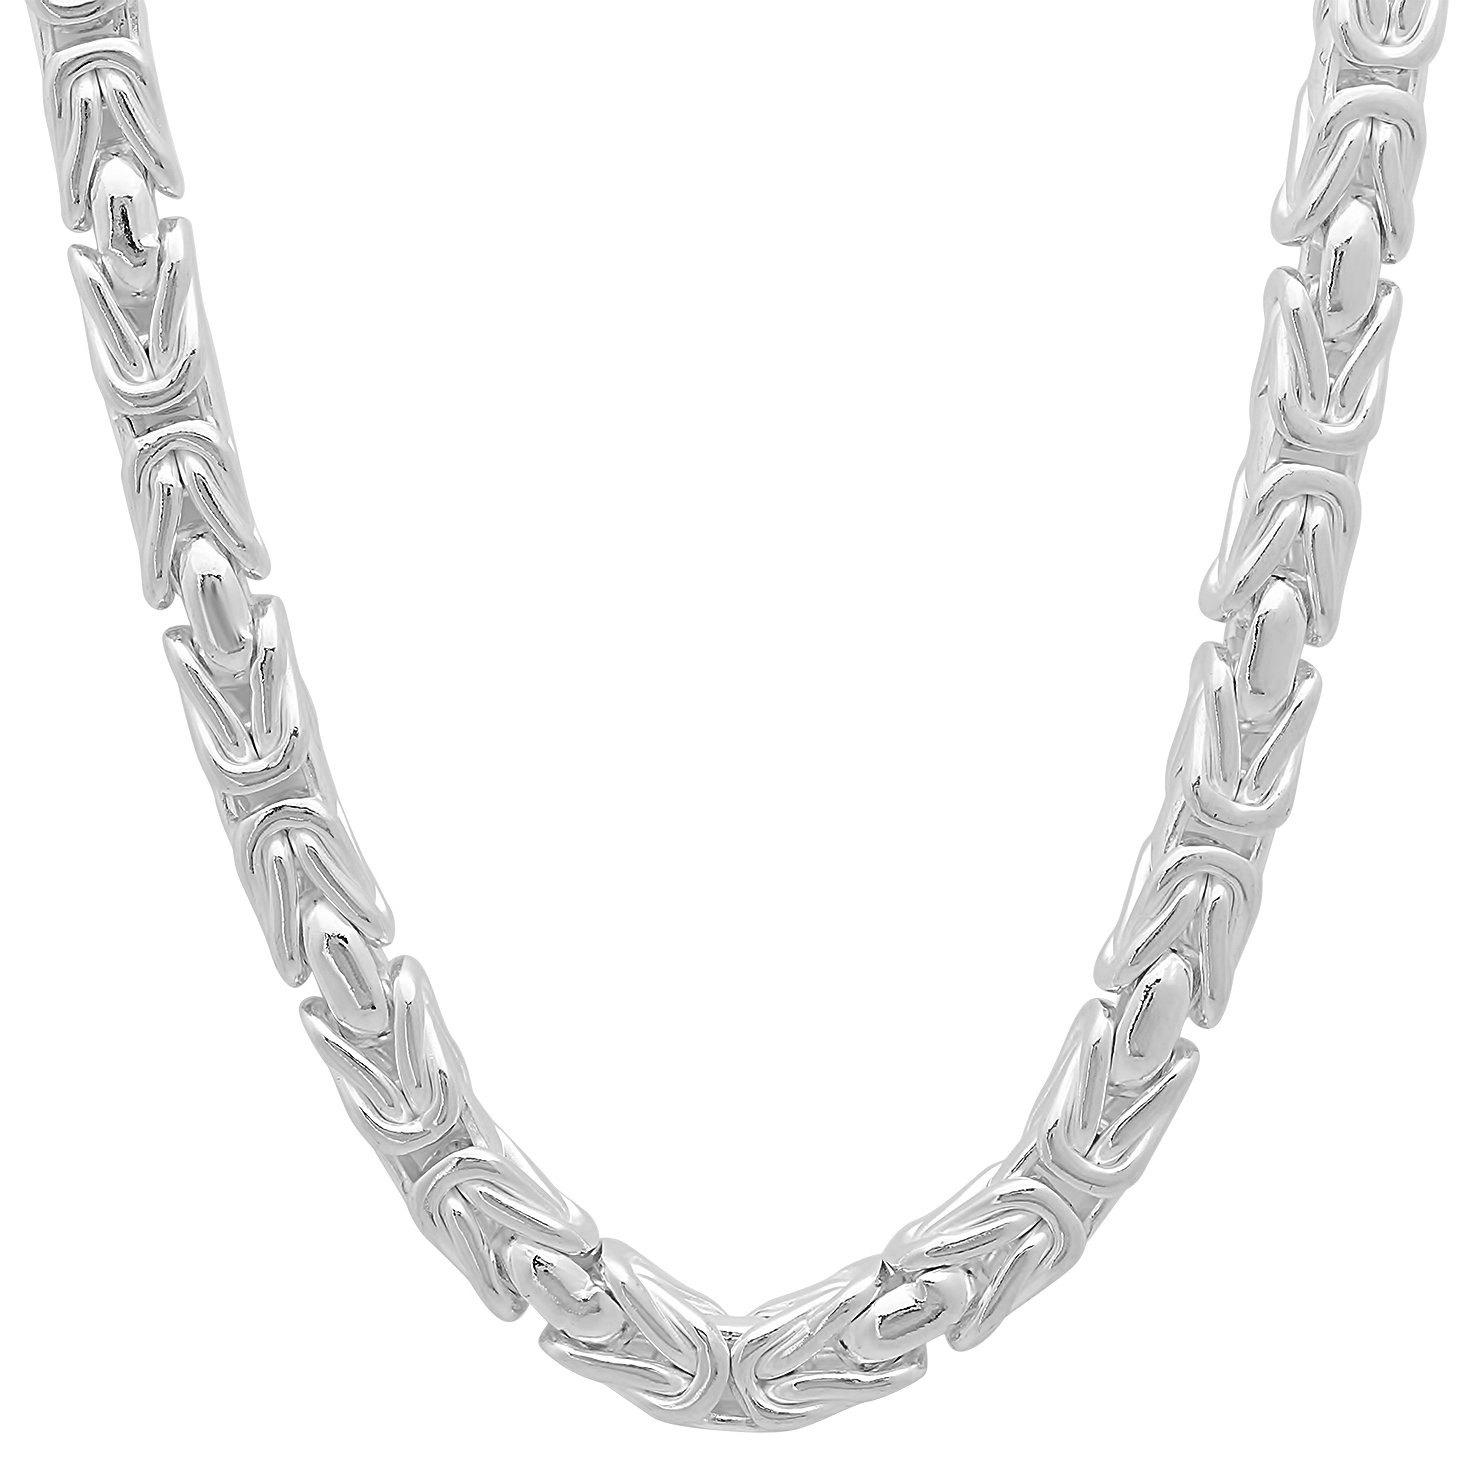 5mm 925 Sterling Silver Nickel-Free Boxed Byzantine Link Italian Chain, 28'' + Bonus Polishing Cloth